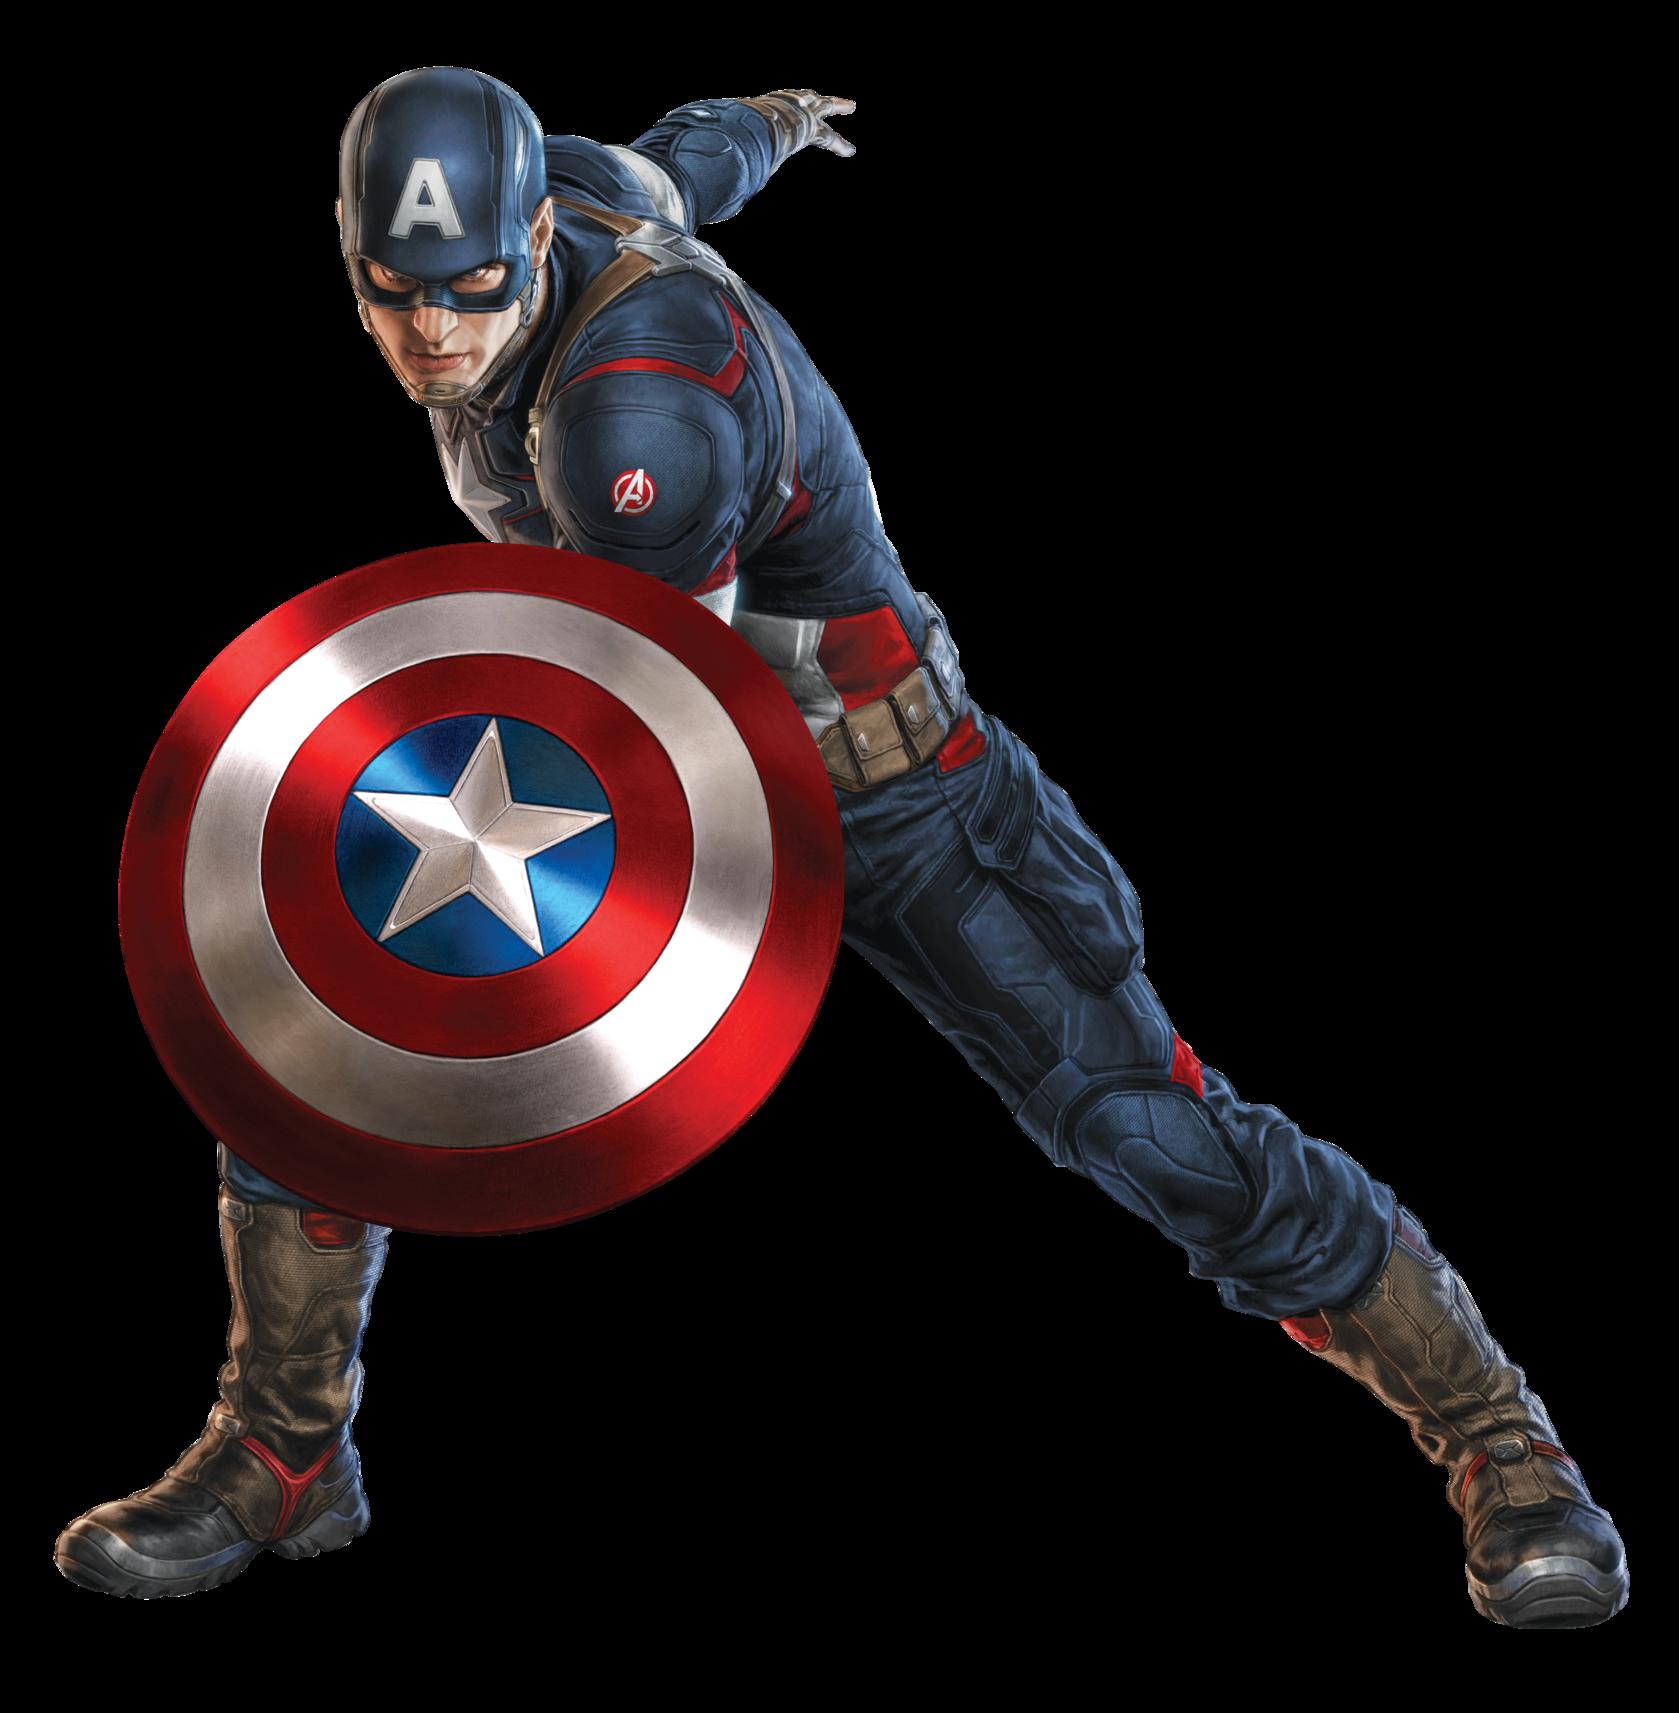 AoU Captain America 2shield-guard.png-AoU Captain America 2shield-guard.png-3